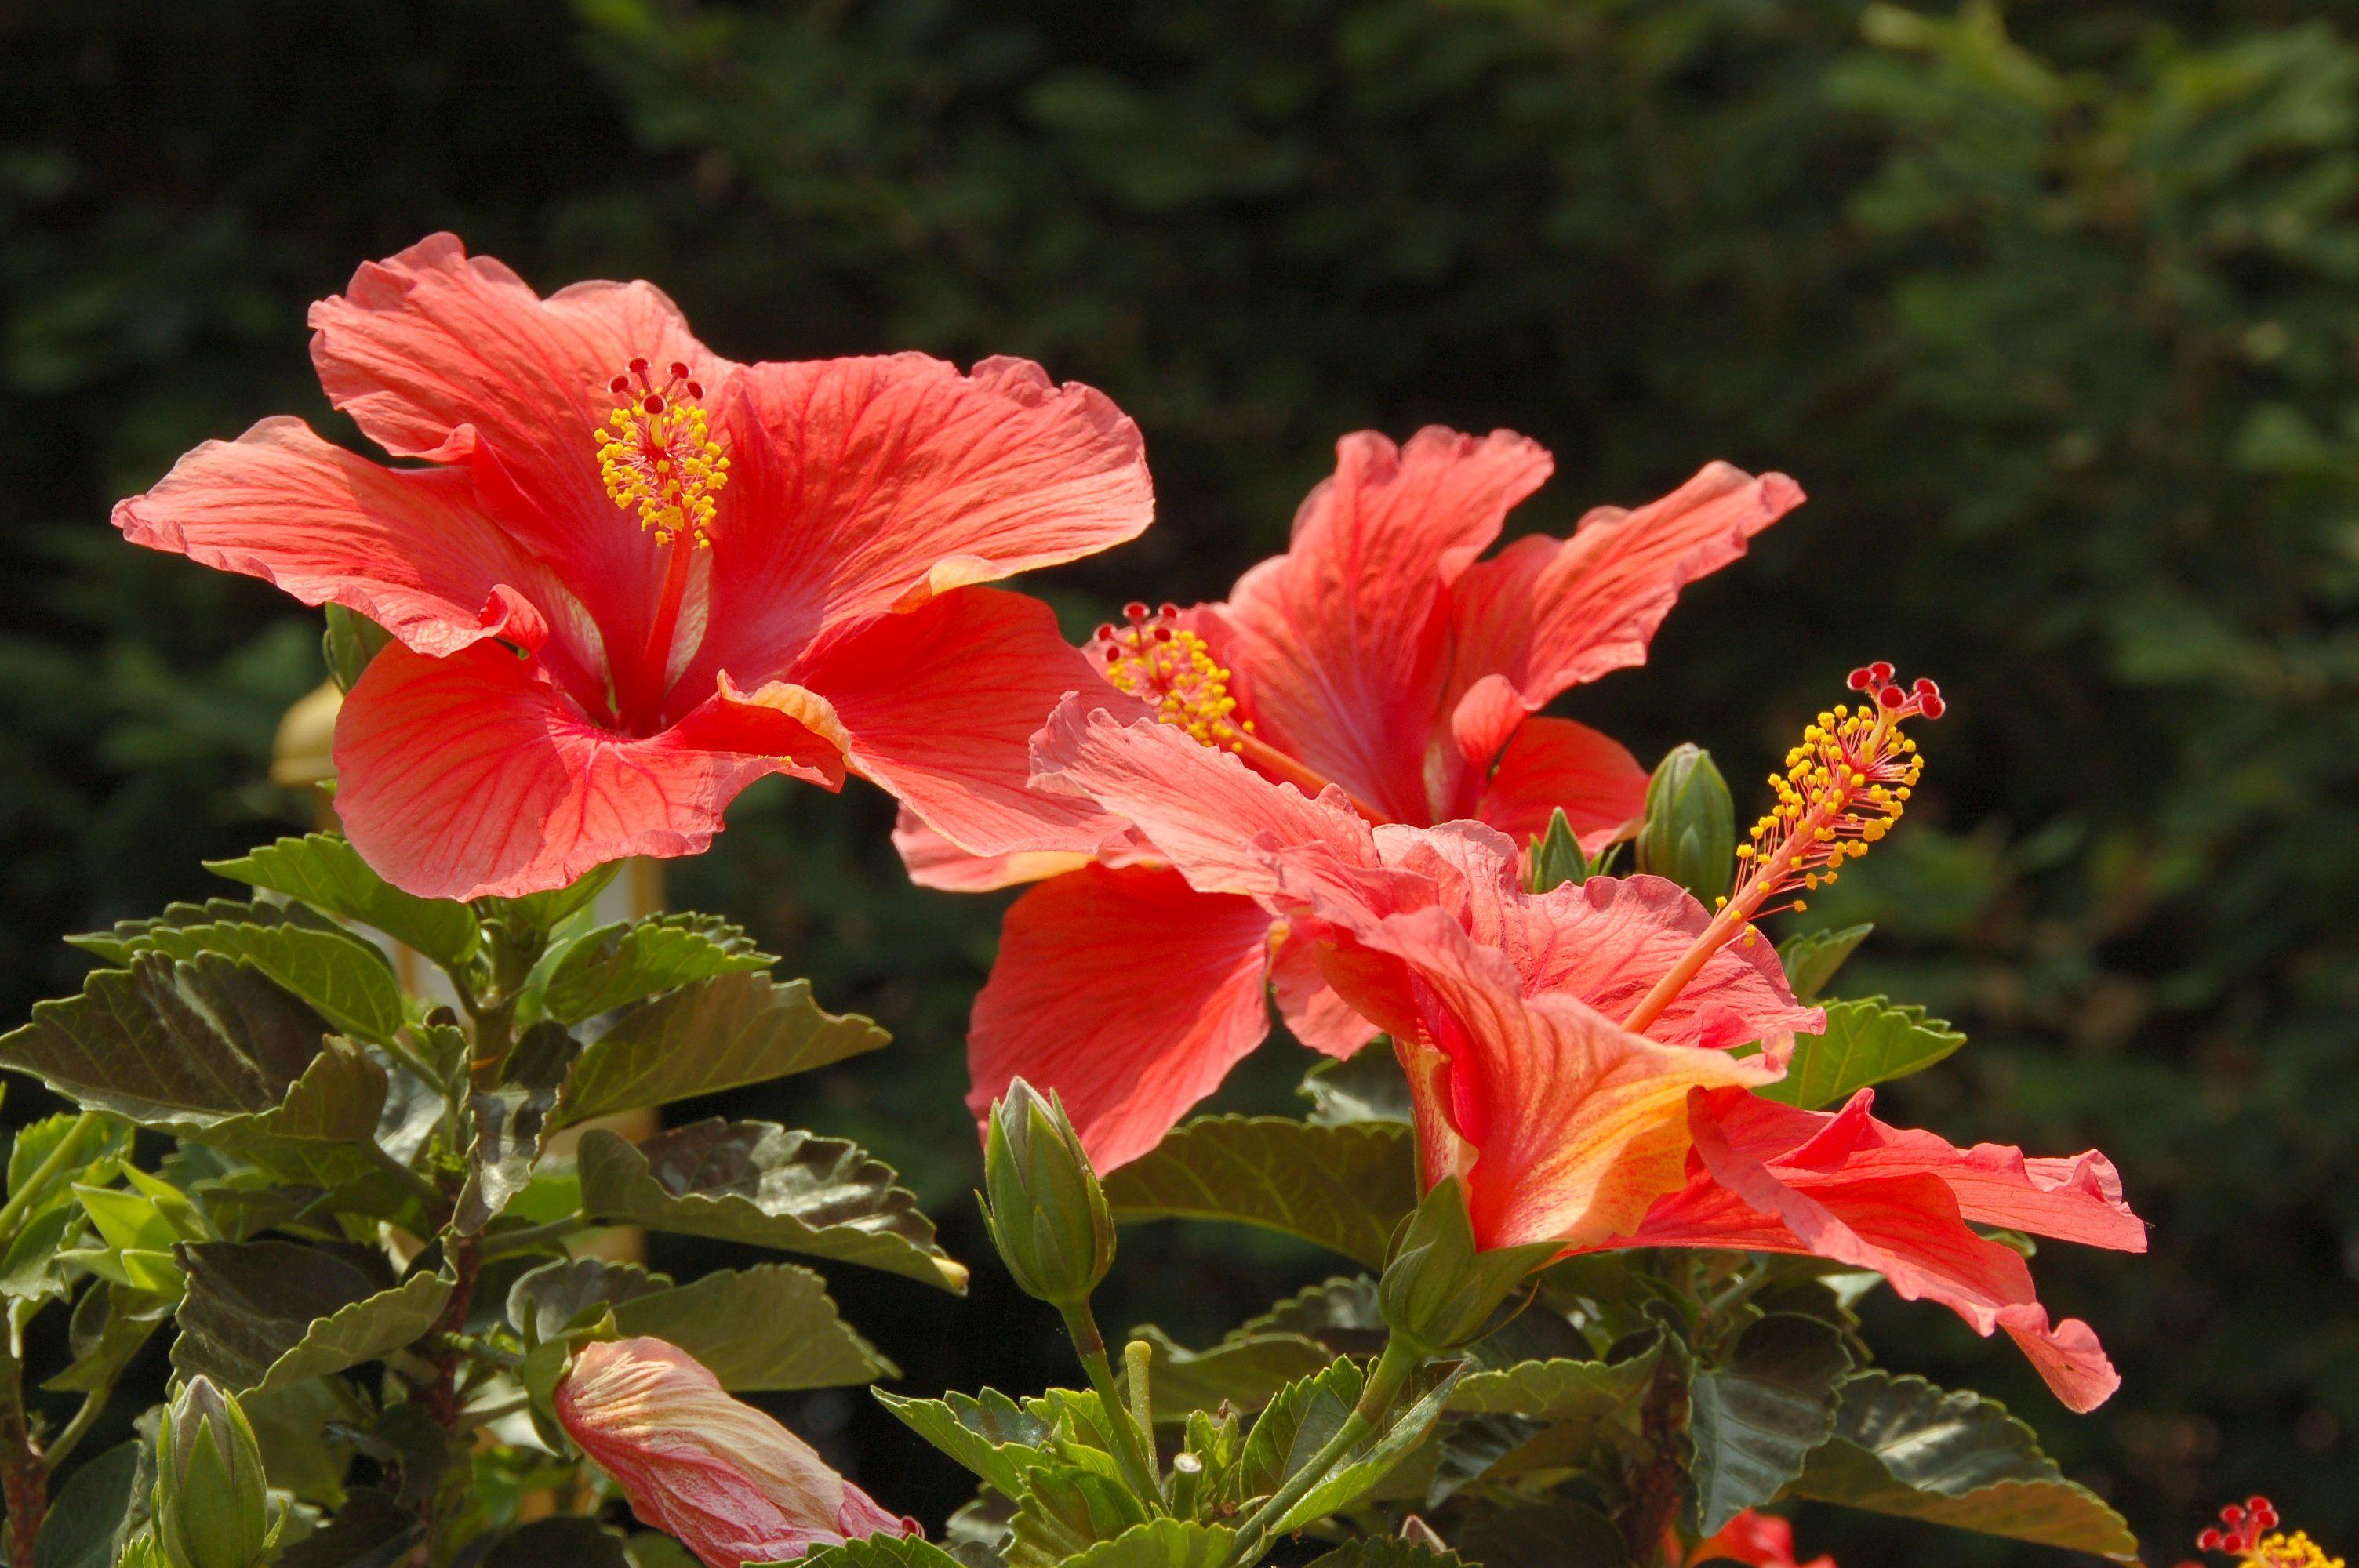 Pin by laura nagy maxim on flower beds pinterest hibiscus visit izmirmasajfo